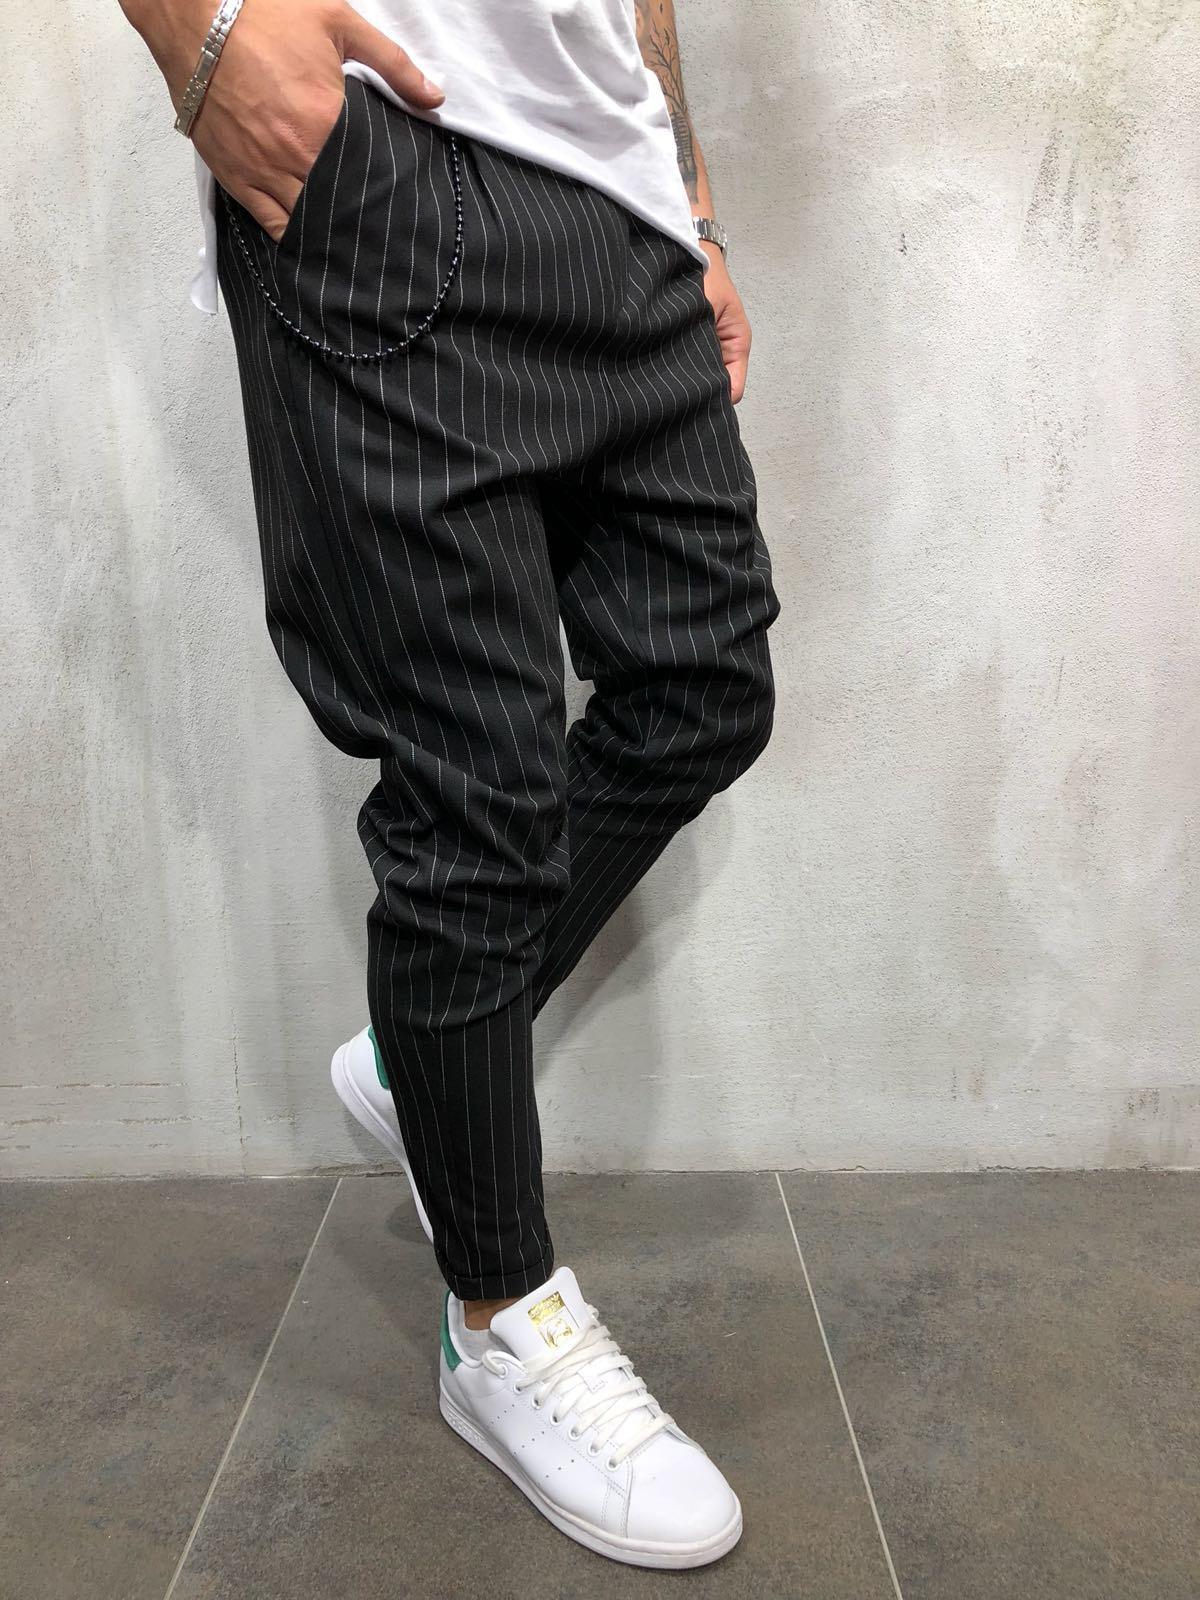 Hd8f13275d7ac495287308822d6921288Z Spring Autumn Casual Men Sweat Pants Male Sportswear Casual Trousers Straight Pants Hip Hop High Street Trousers Pants Joggers